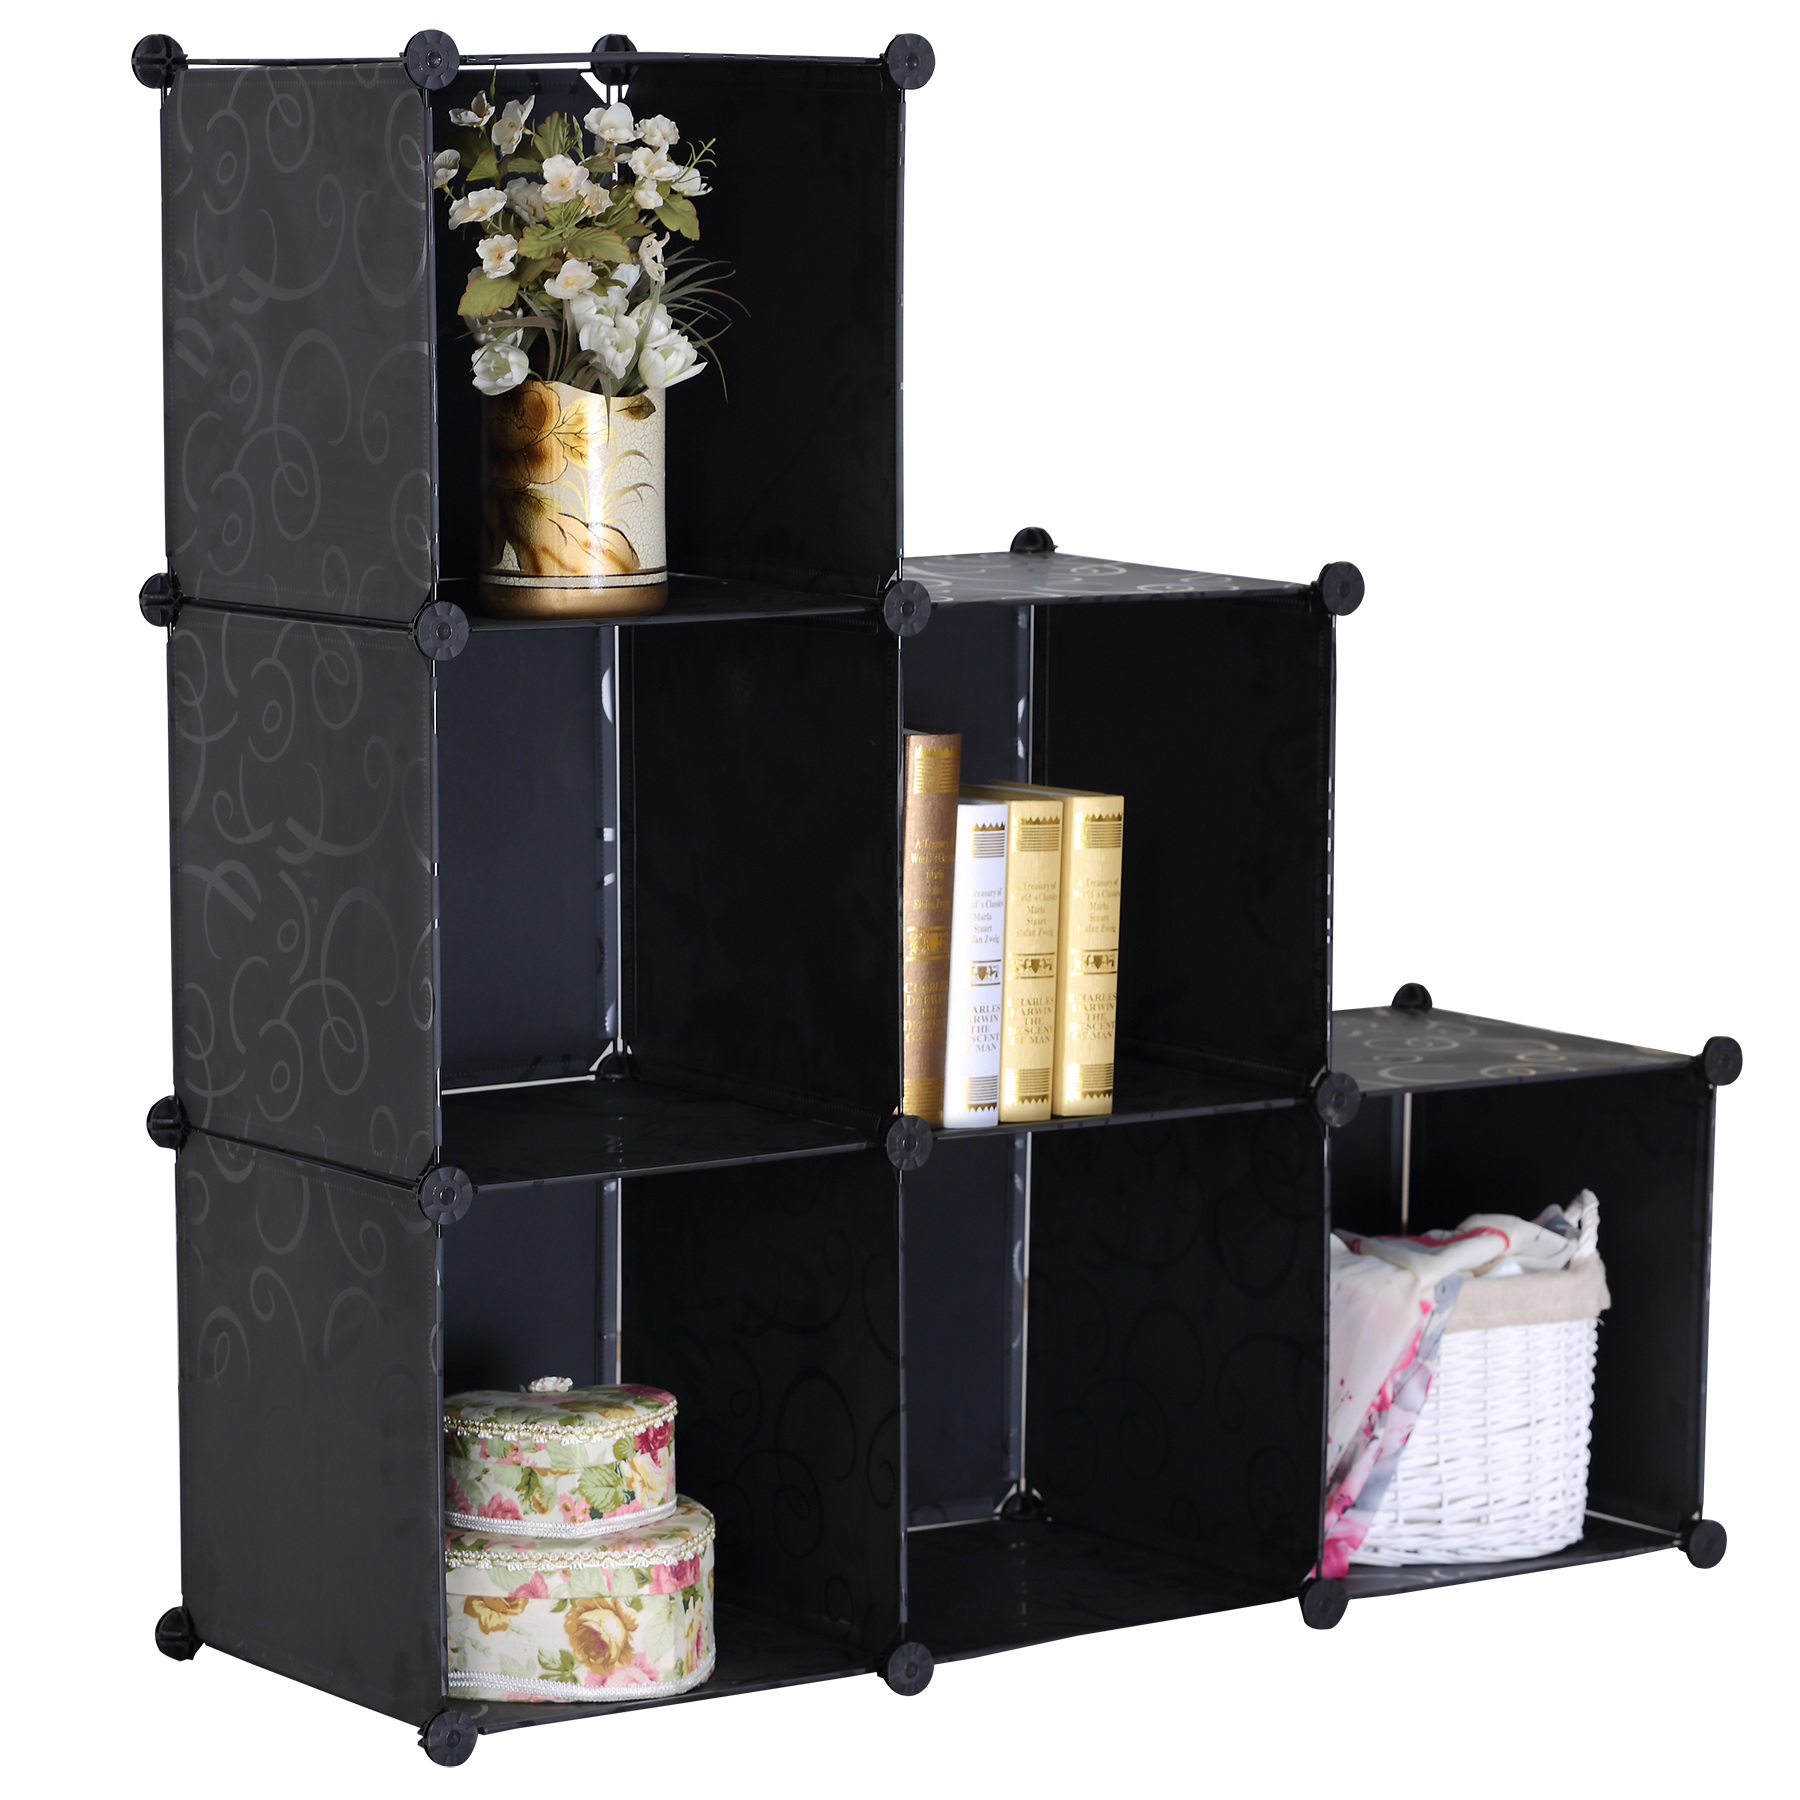 kleiderschrank kunststoff garderobenschrank steckregal. Black Bedroom Furniture Sets. Home Design Ideas